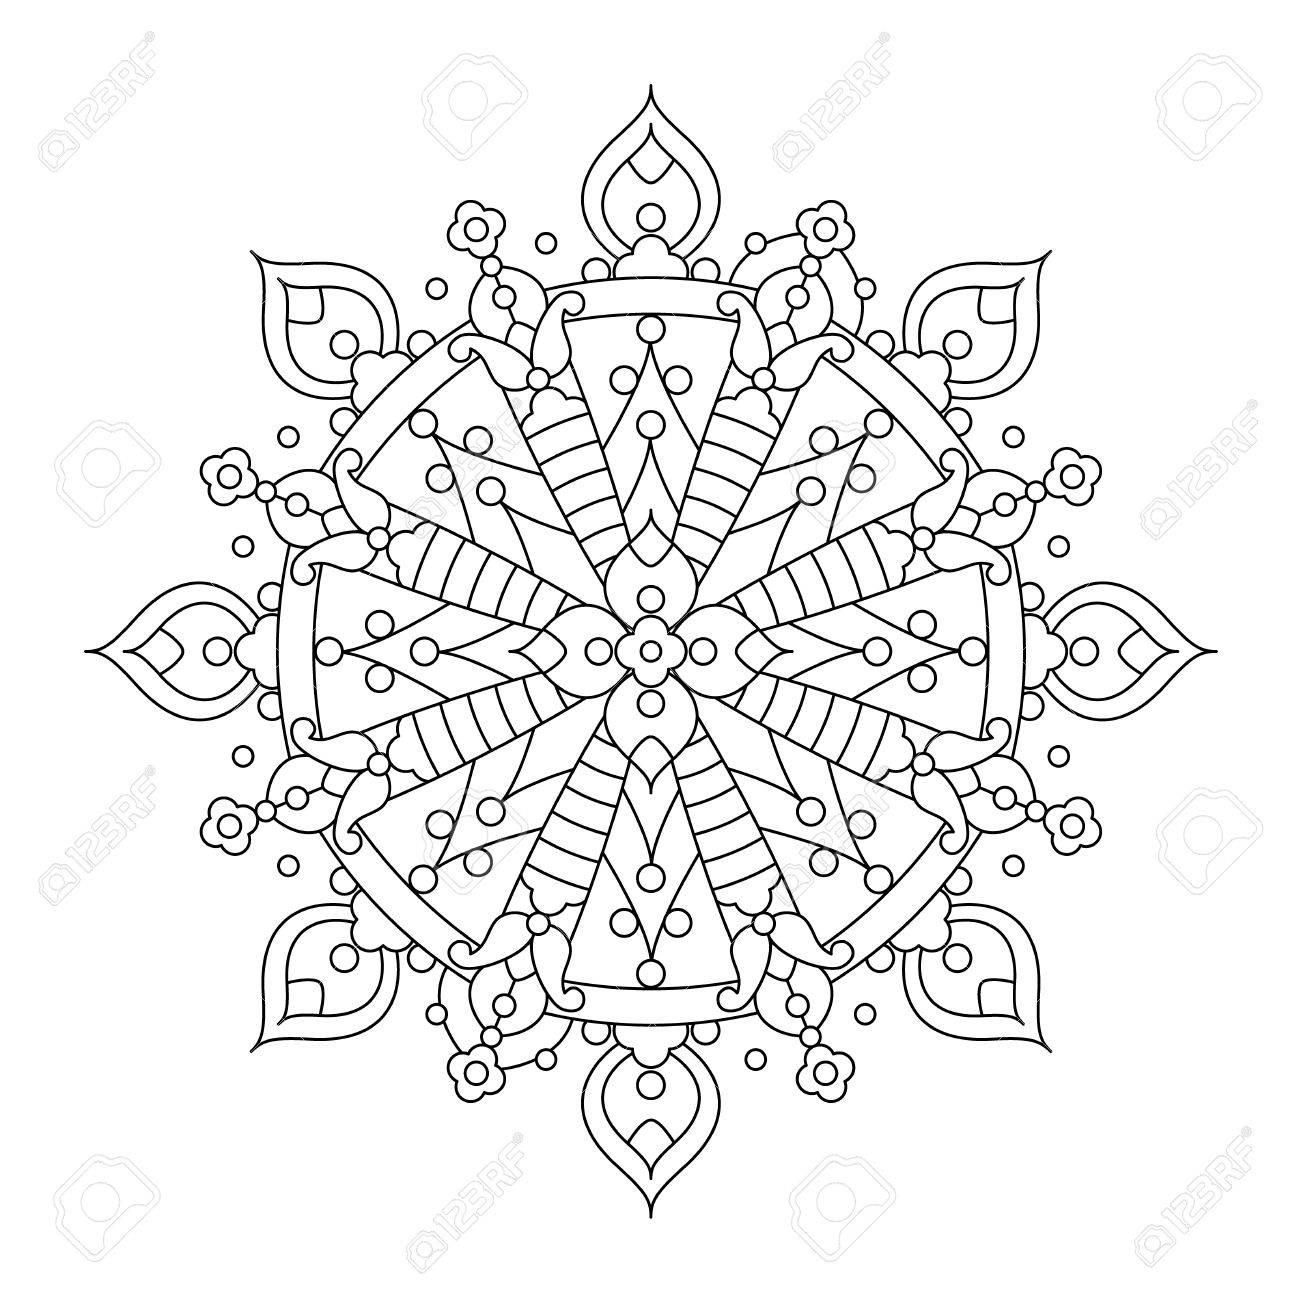 Mandala Abstracta O Línea De Copo De Nieve Caprichoso Diseño De Arte ...